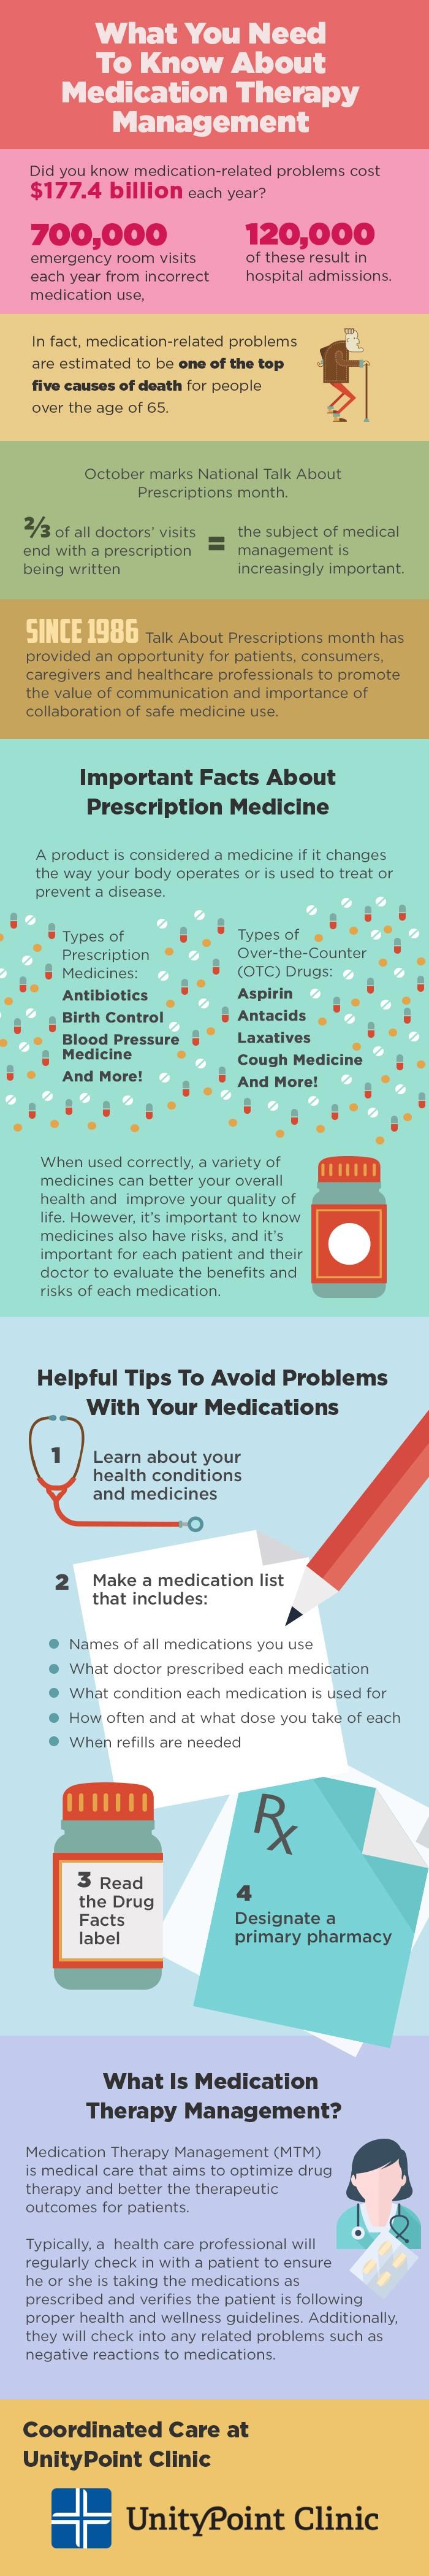 info3 - 4 important reasons patients should complete their prescription